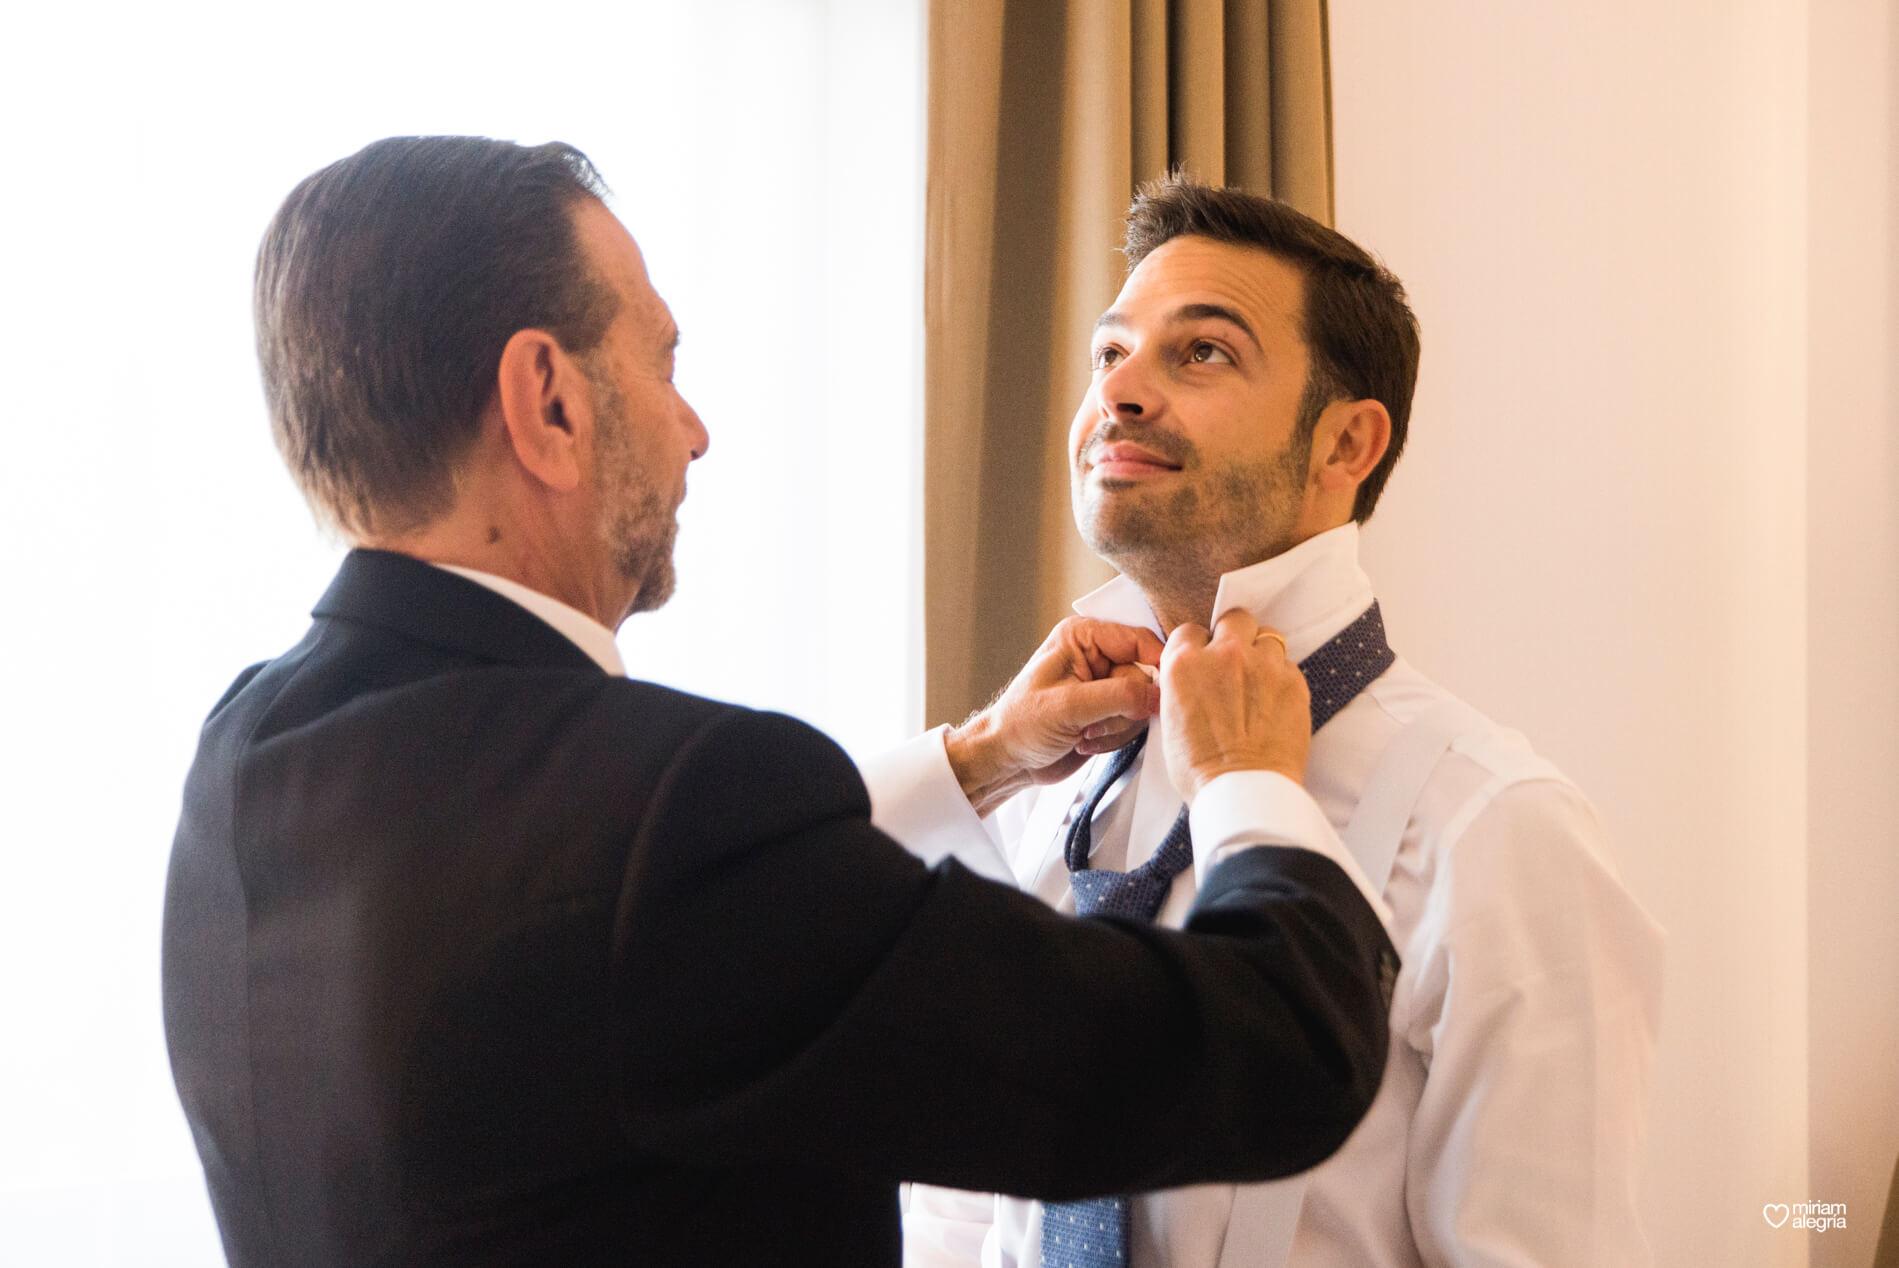 vestido-de-novia-paula-del-vas-miriam-alegria-fotografos-boda-murcia-166